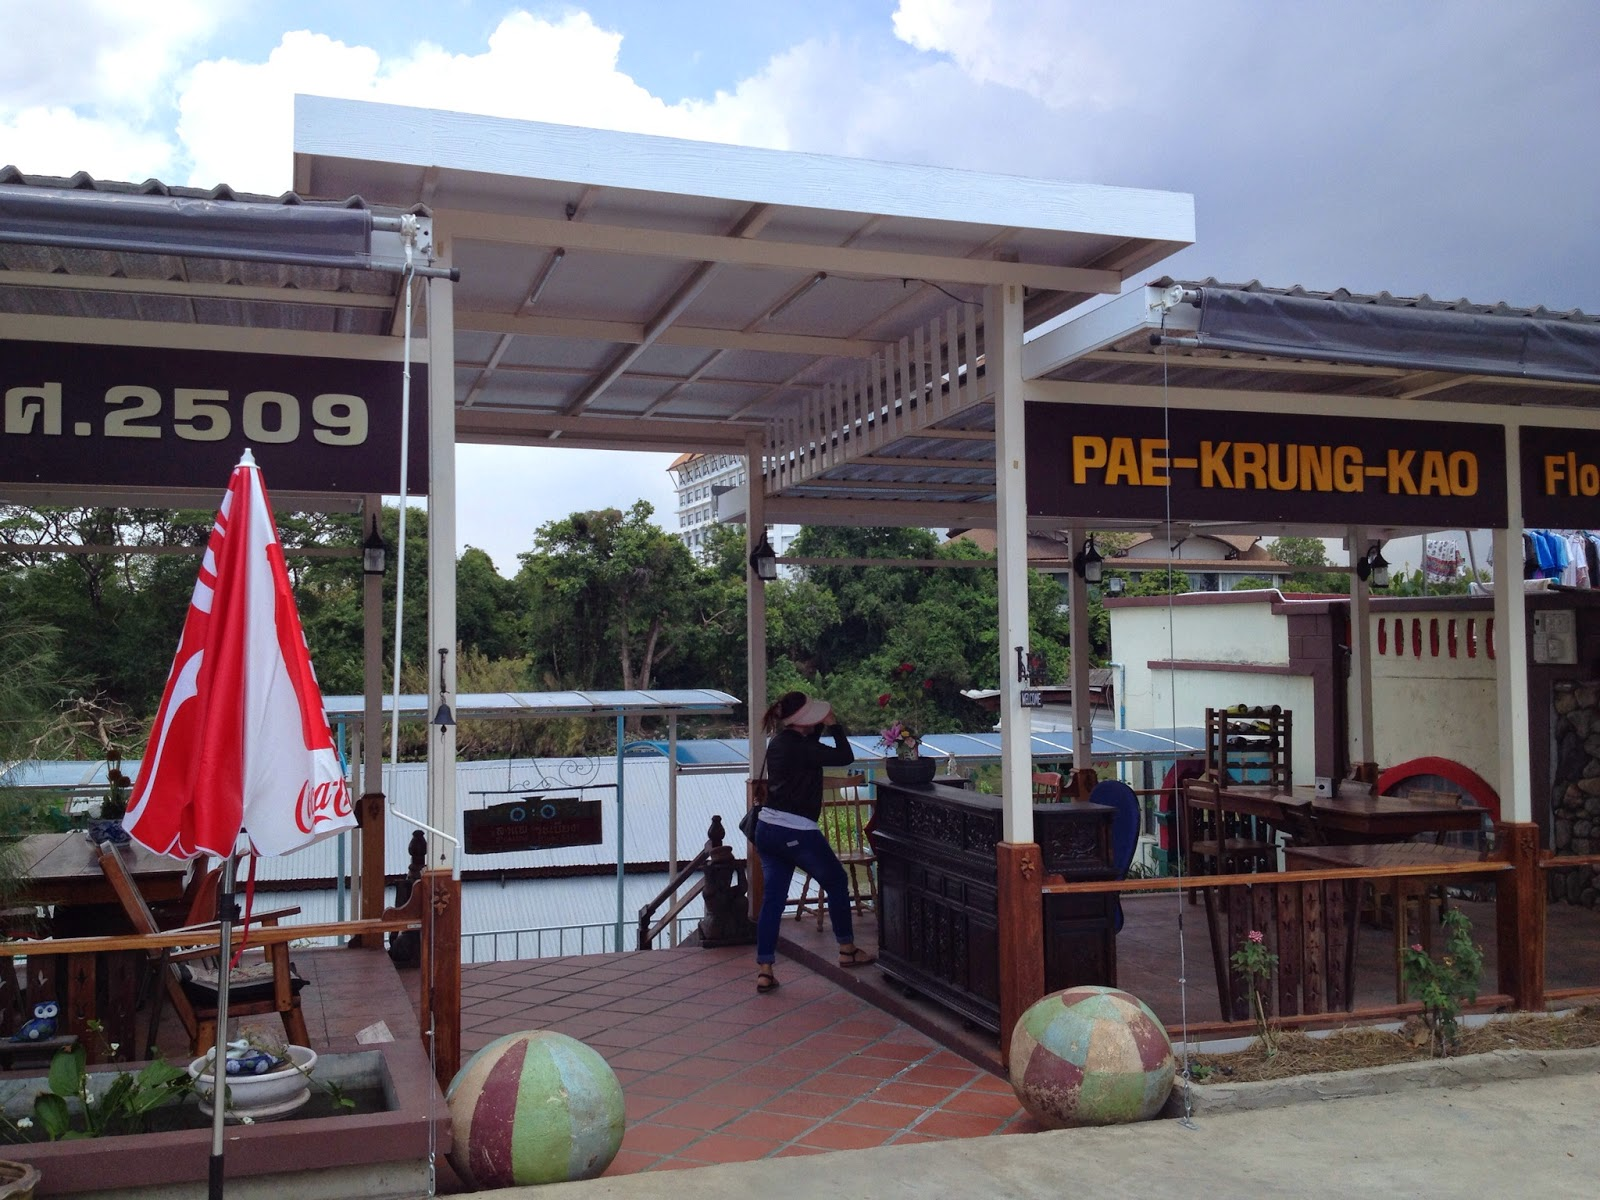 Ayutthaya - Floating restaurant Pae Krung Kao